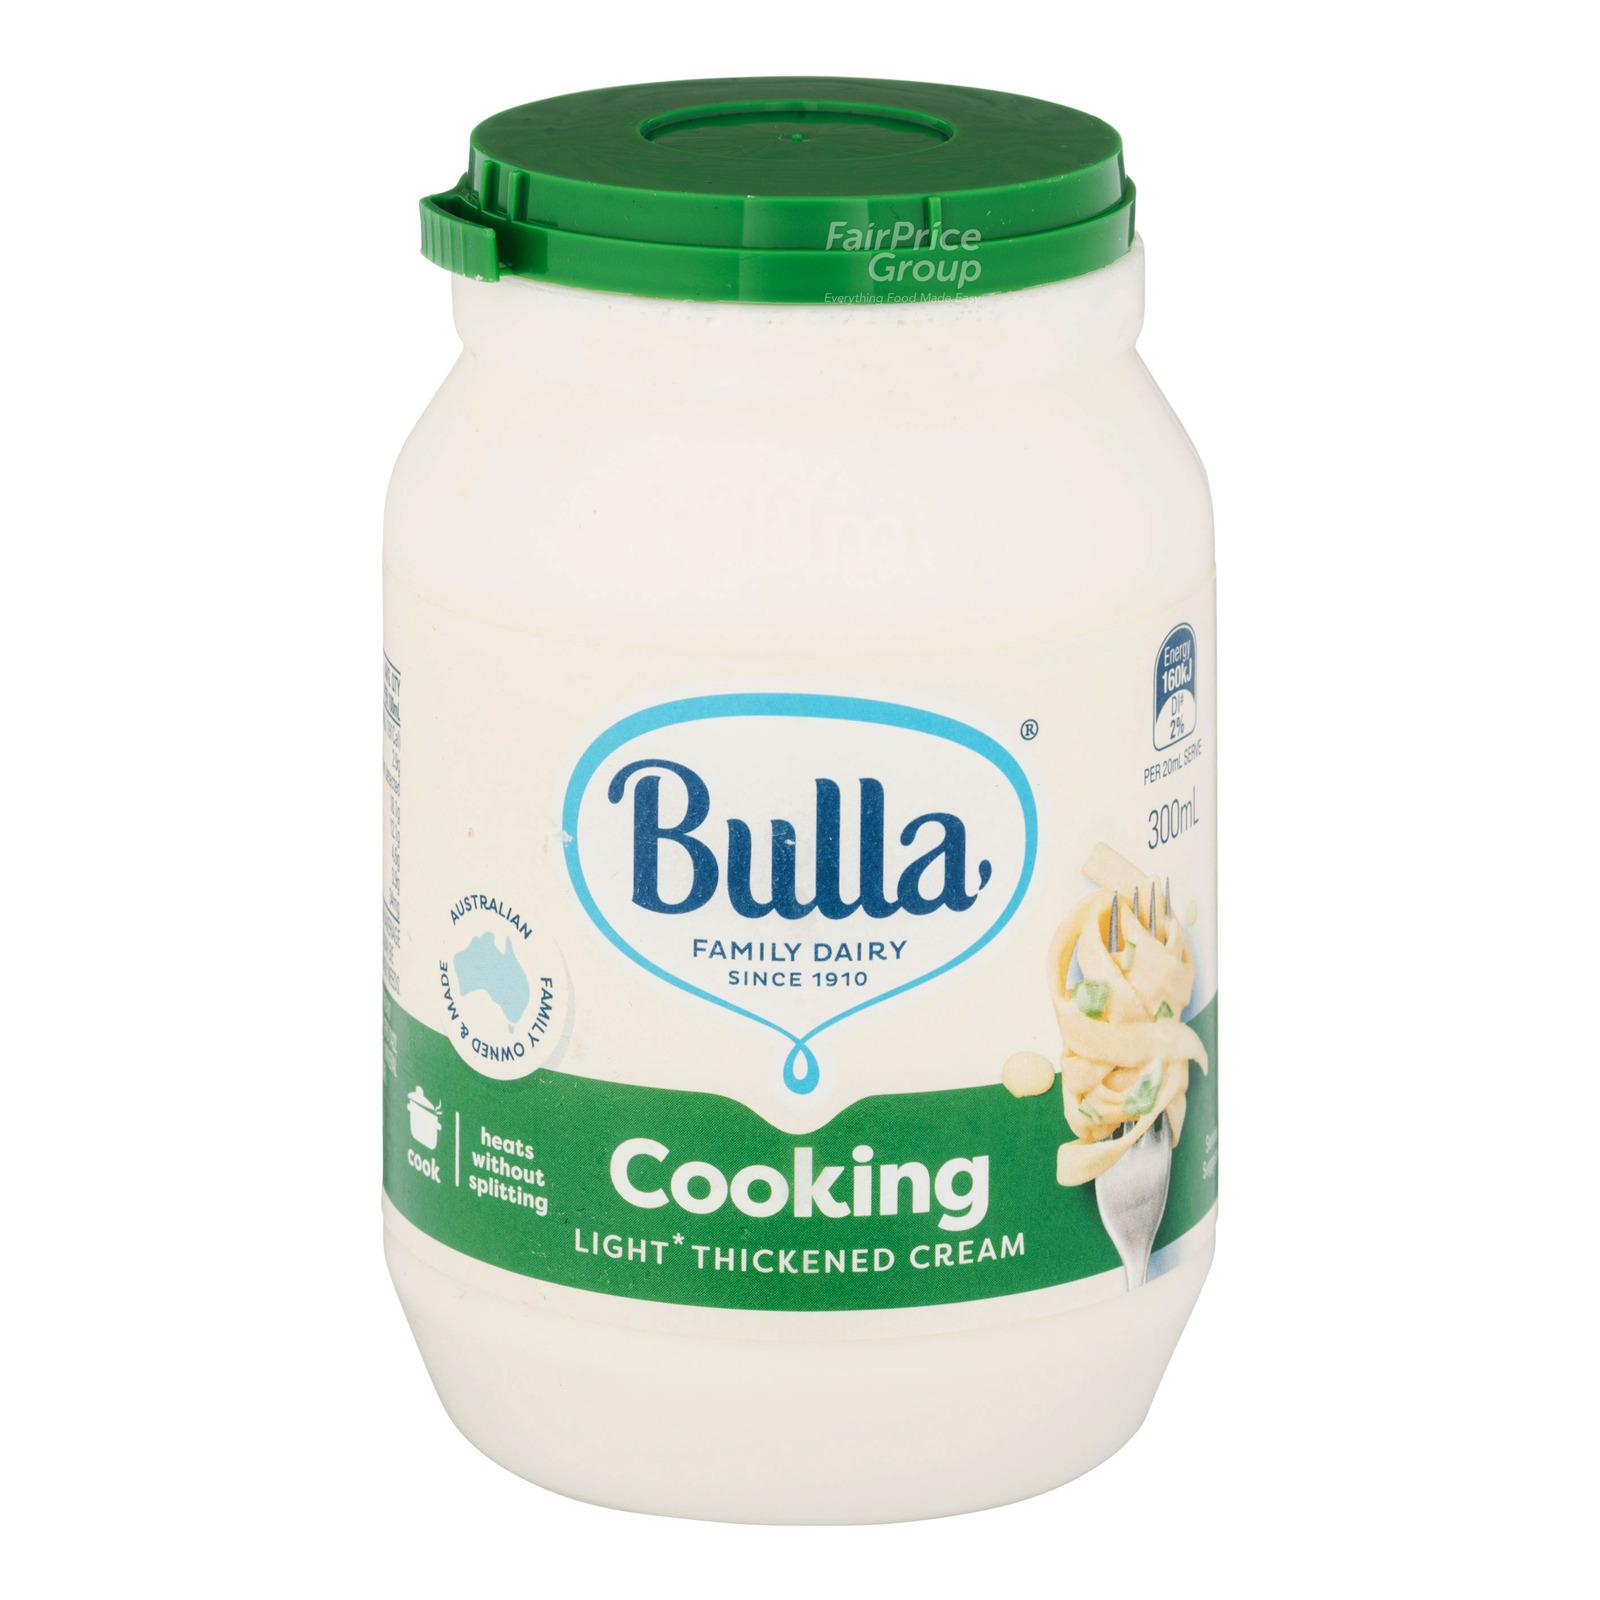 Bulla Thickened Cream - Cooking (Light)